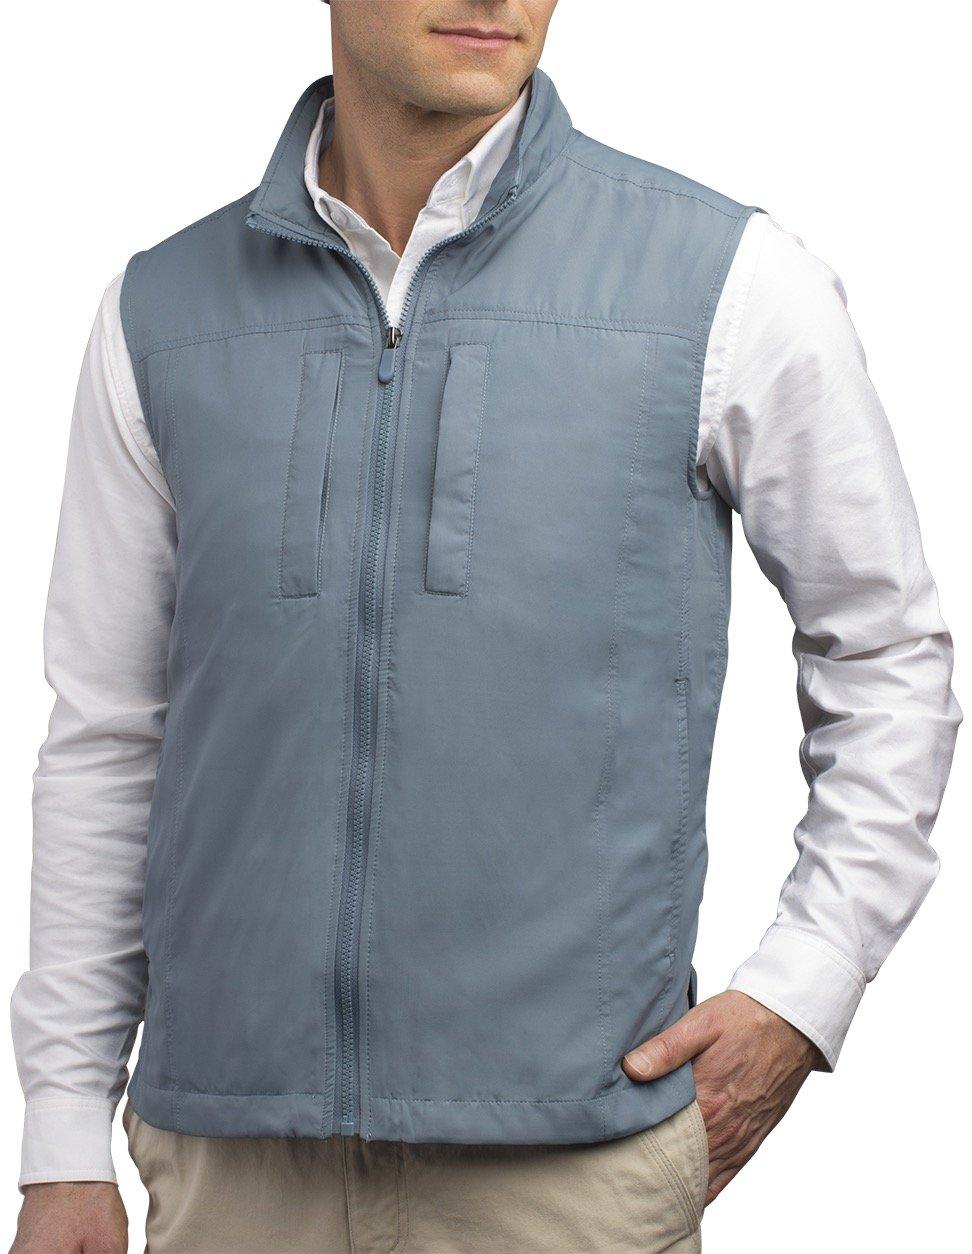 SCOTTeVEST Men's Featherweight Vest - 14 Pockets - Travel Clothing CDB L by SCOTTeVEST